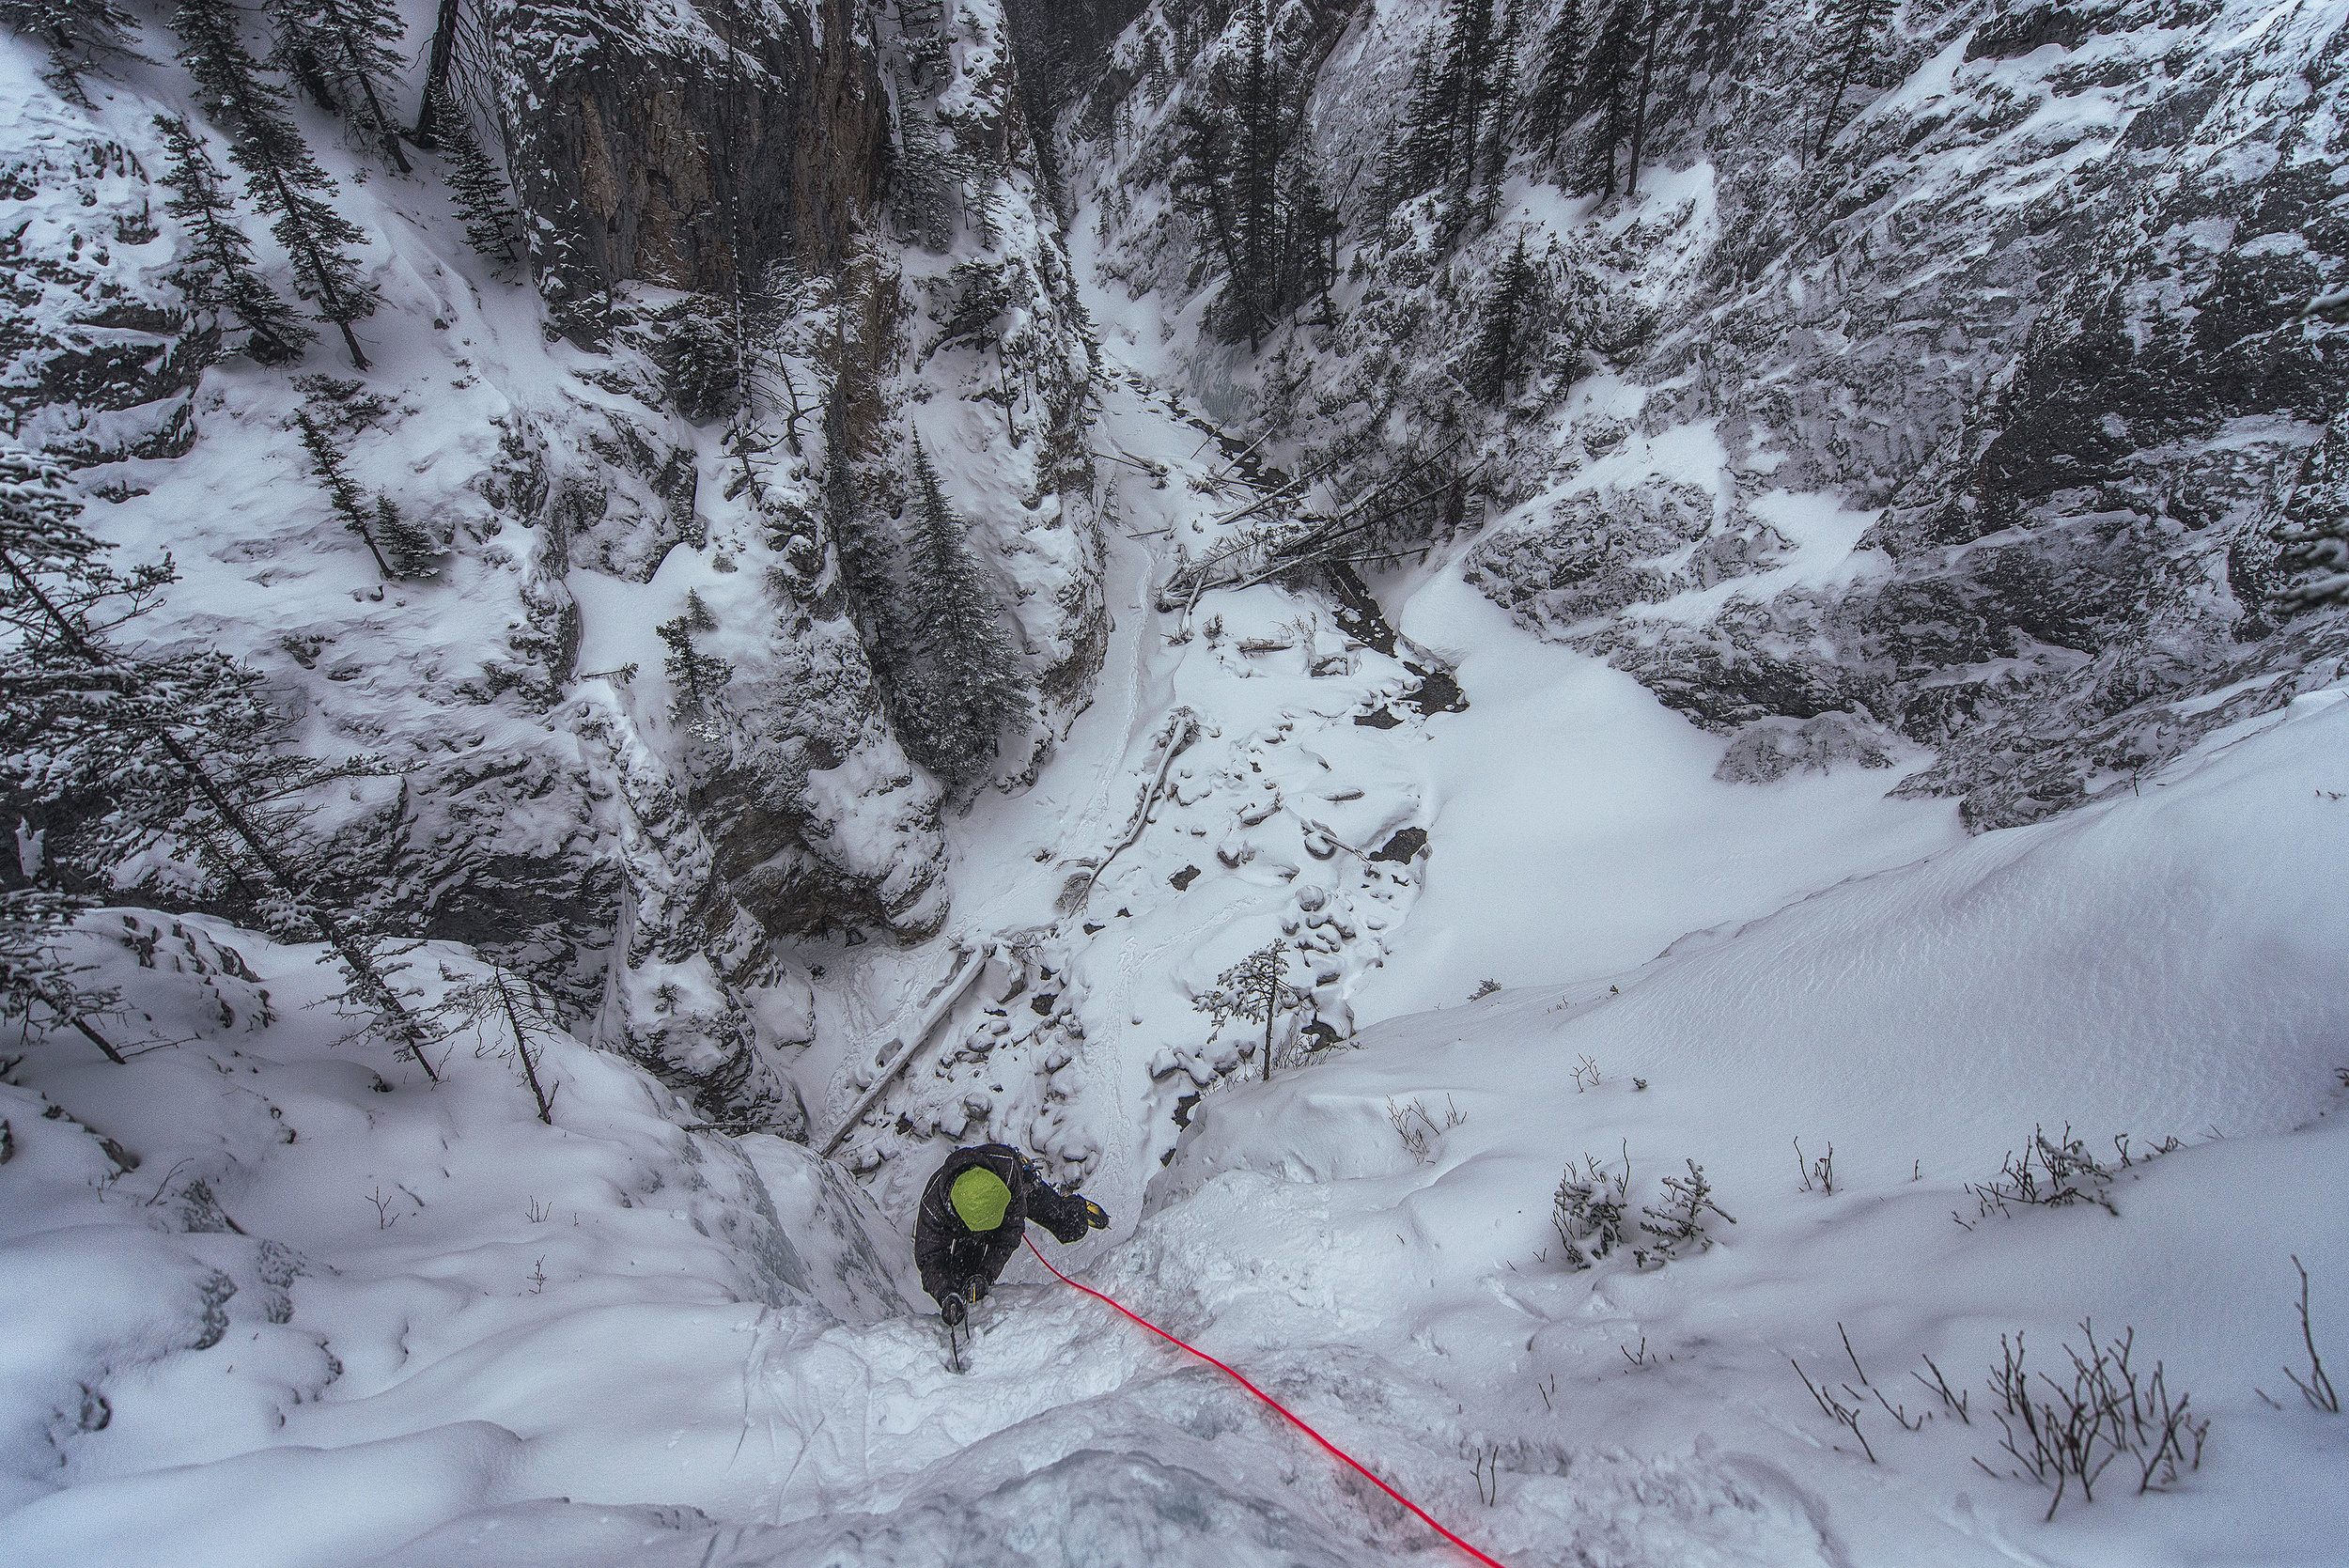 austin-trigg-ice-climbing-king-creek-alberta.jpg